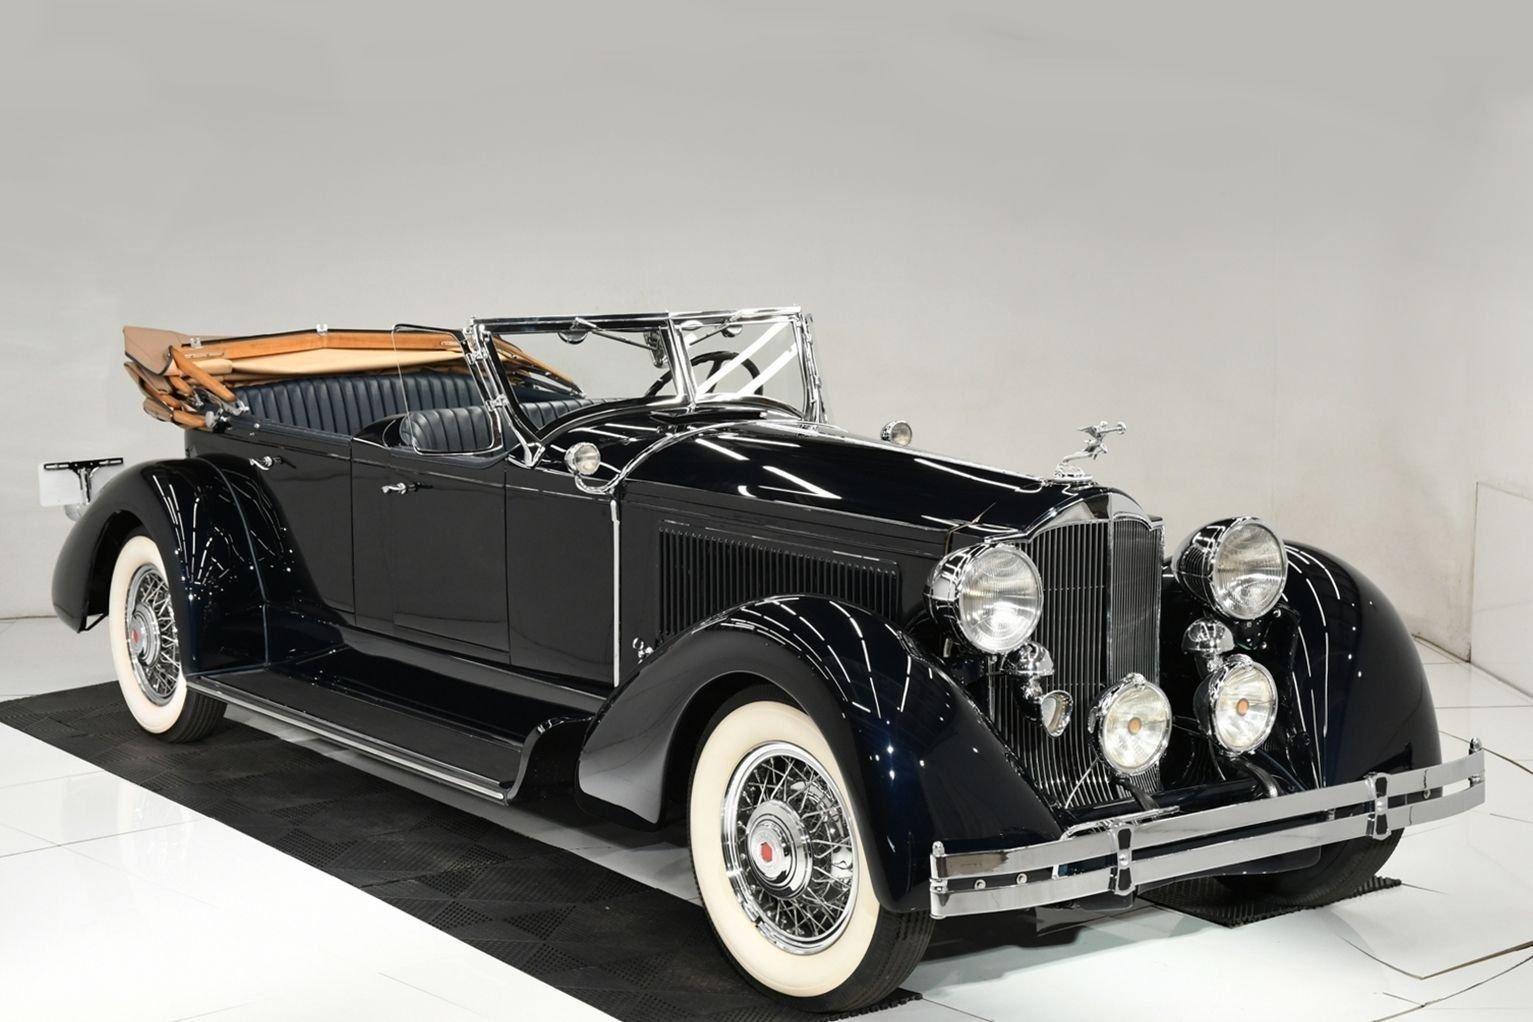 1930 packard phaeton lebaron convertible